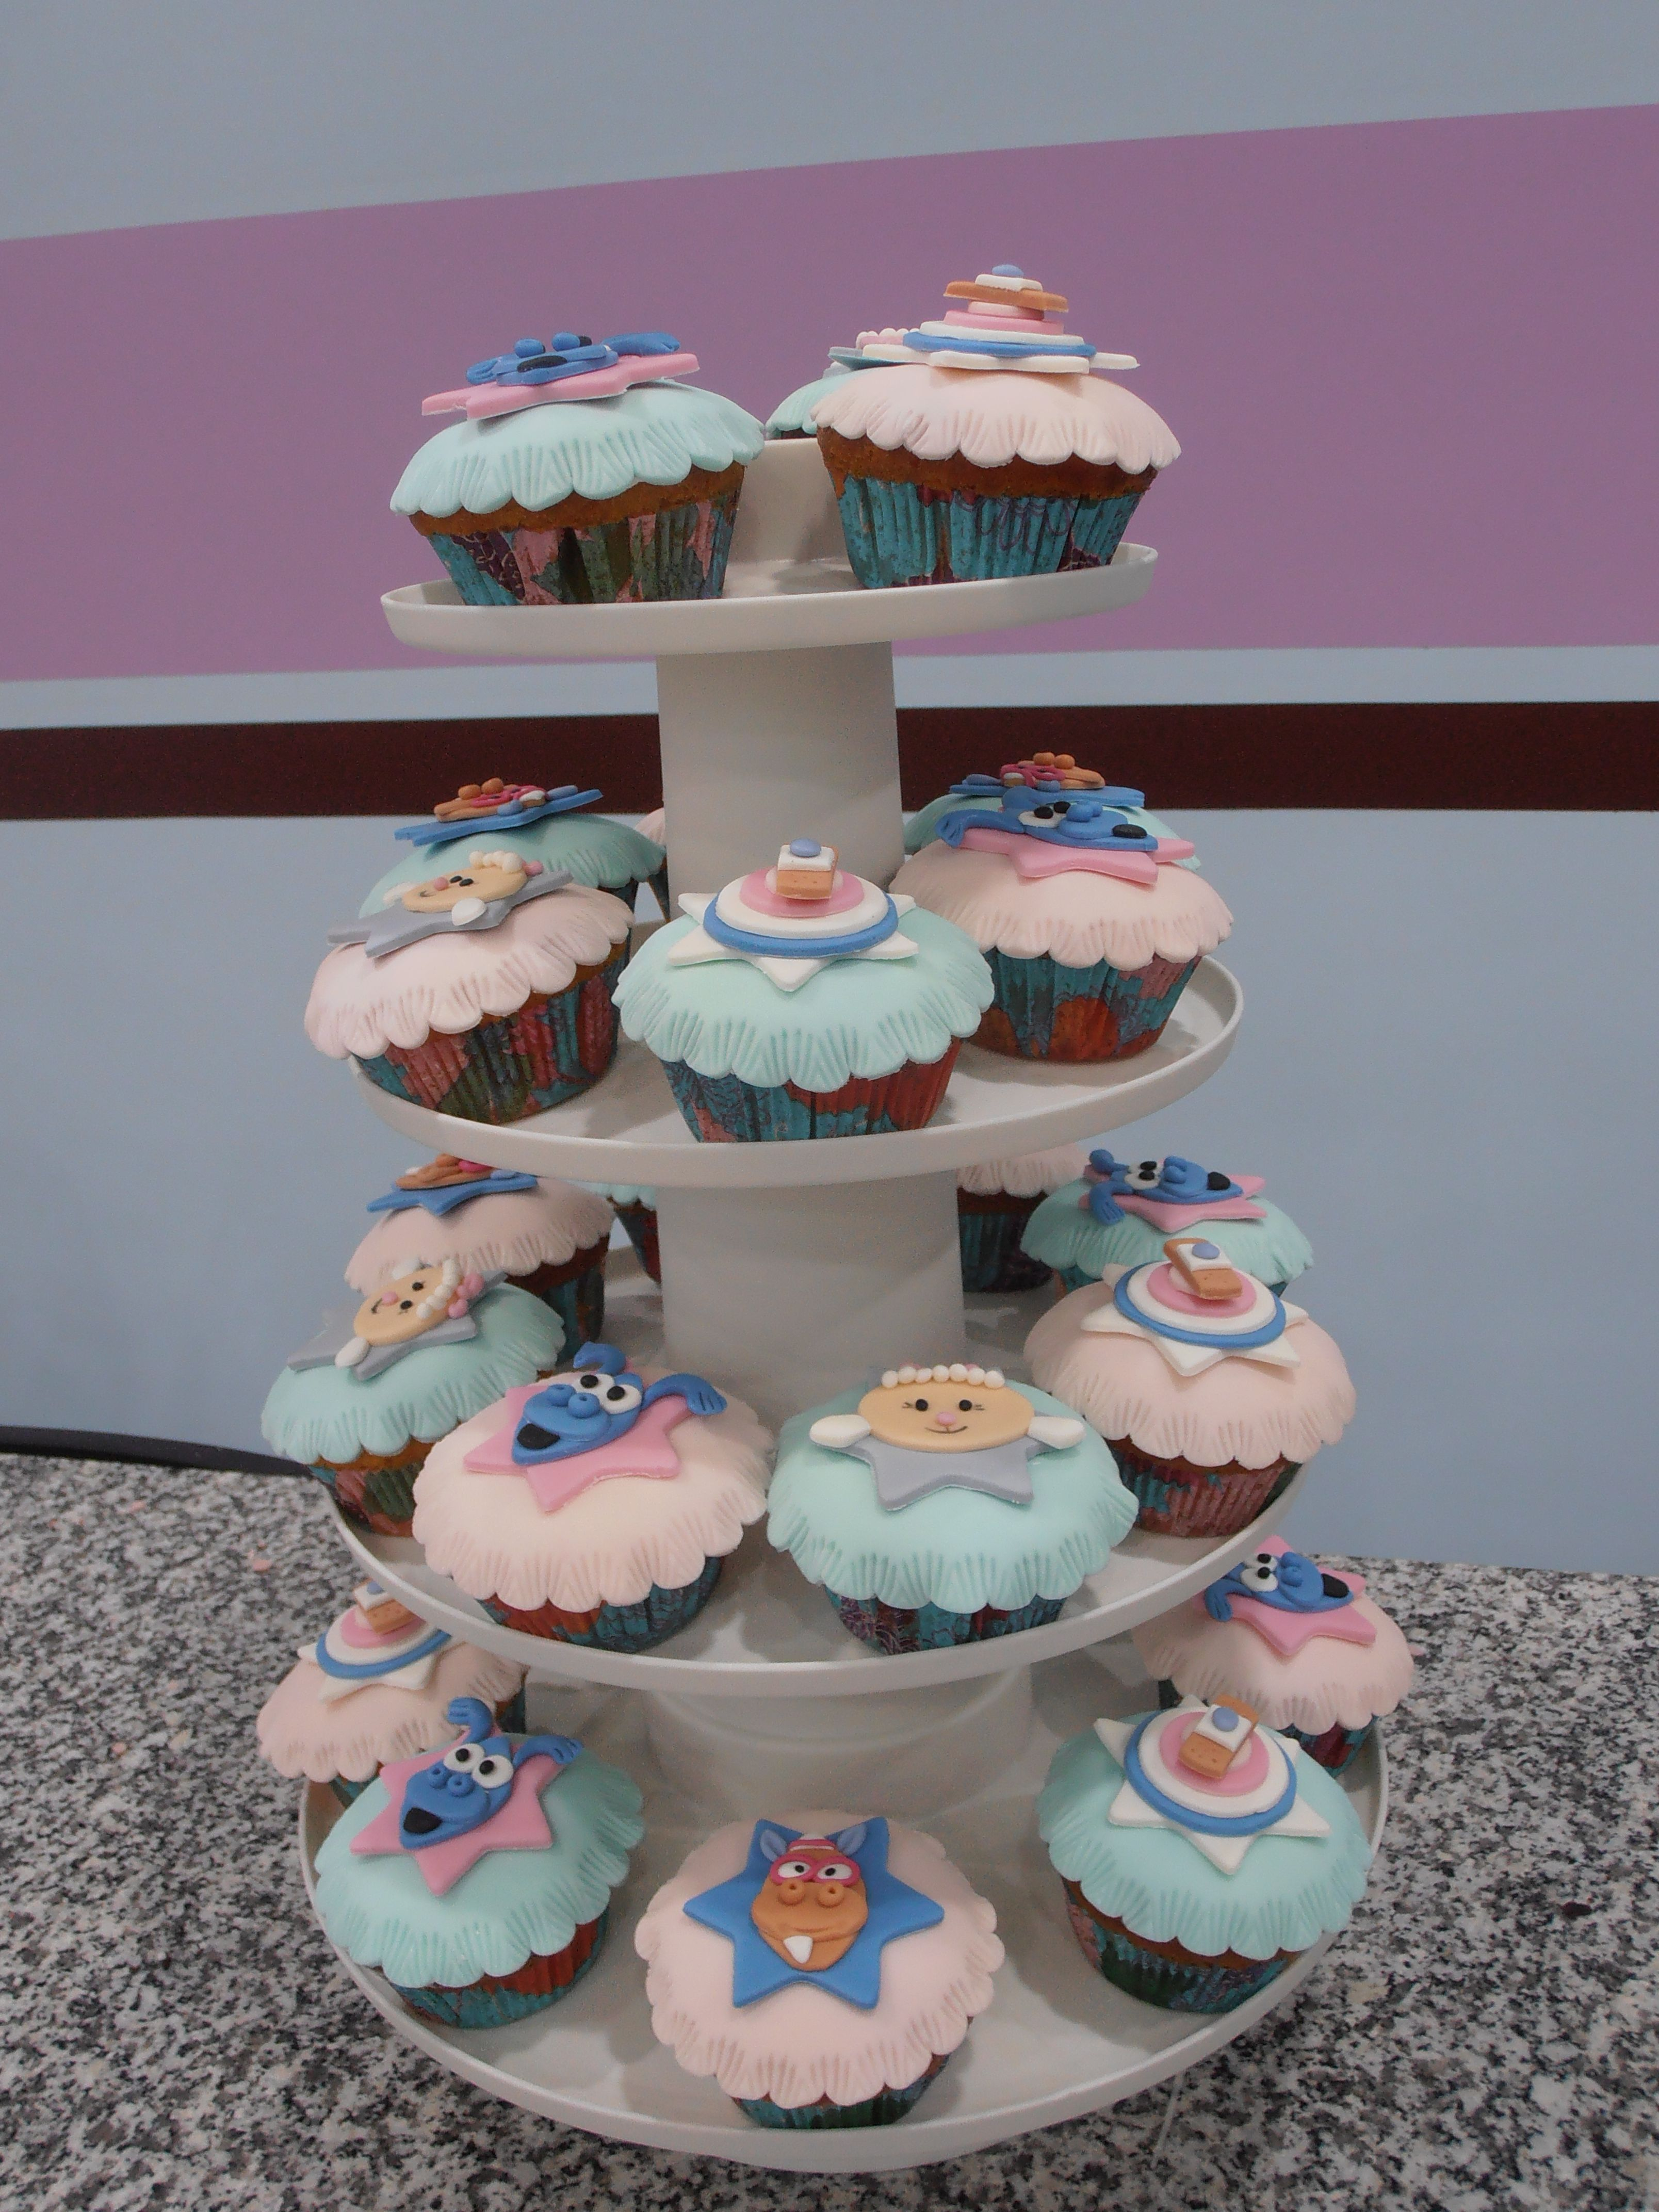 doutora brinquedos (Doc Mucstuffins) cupcakes